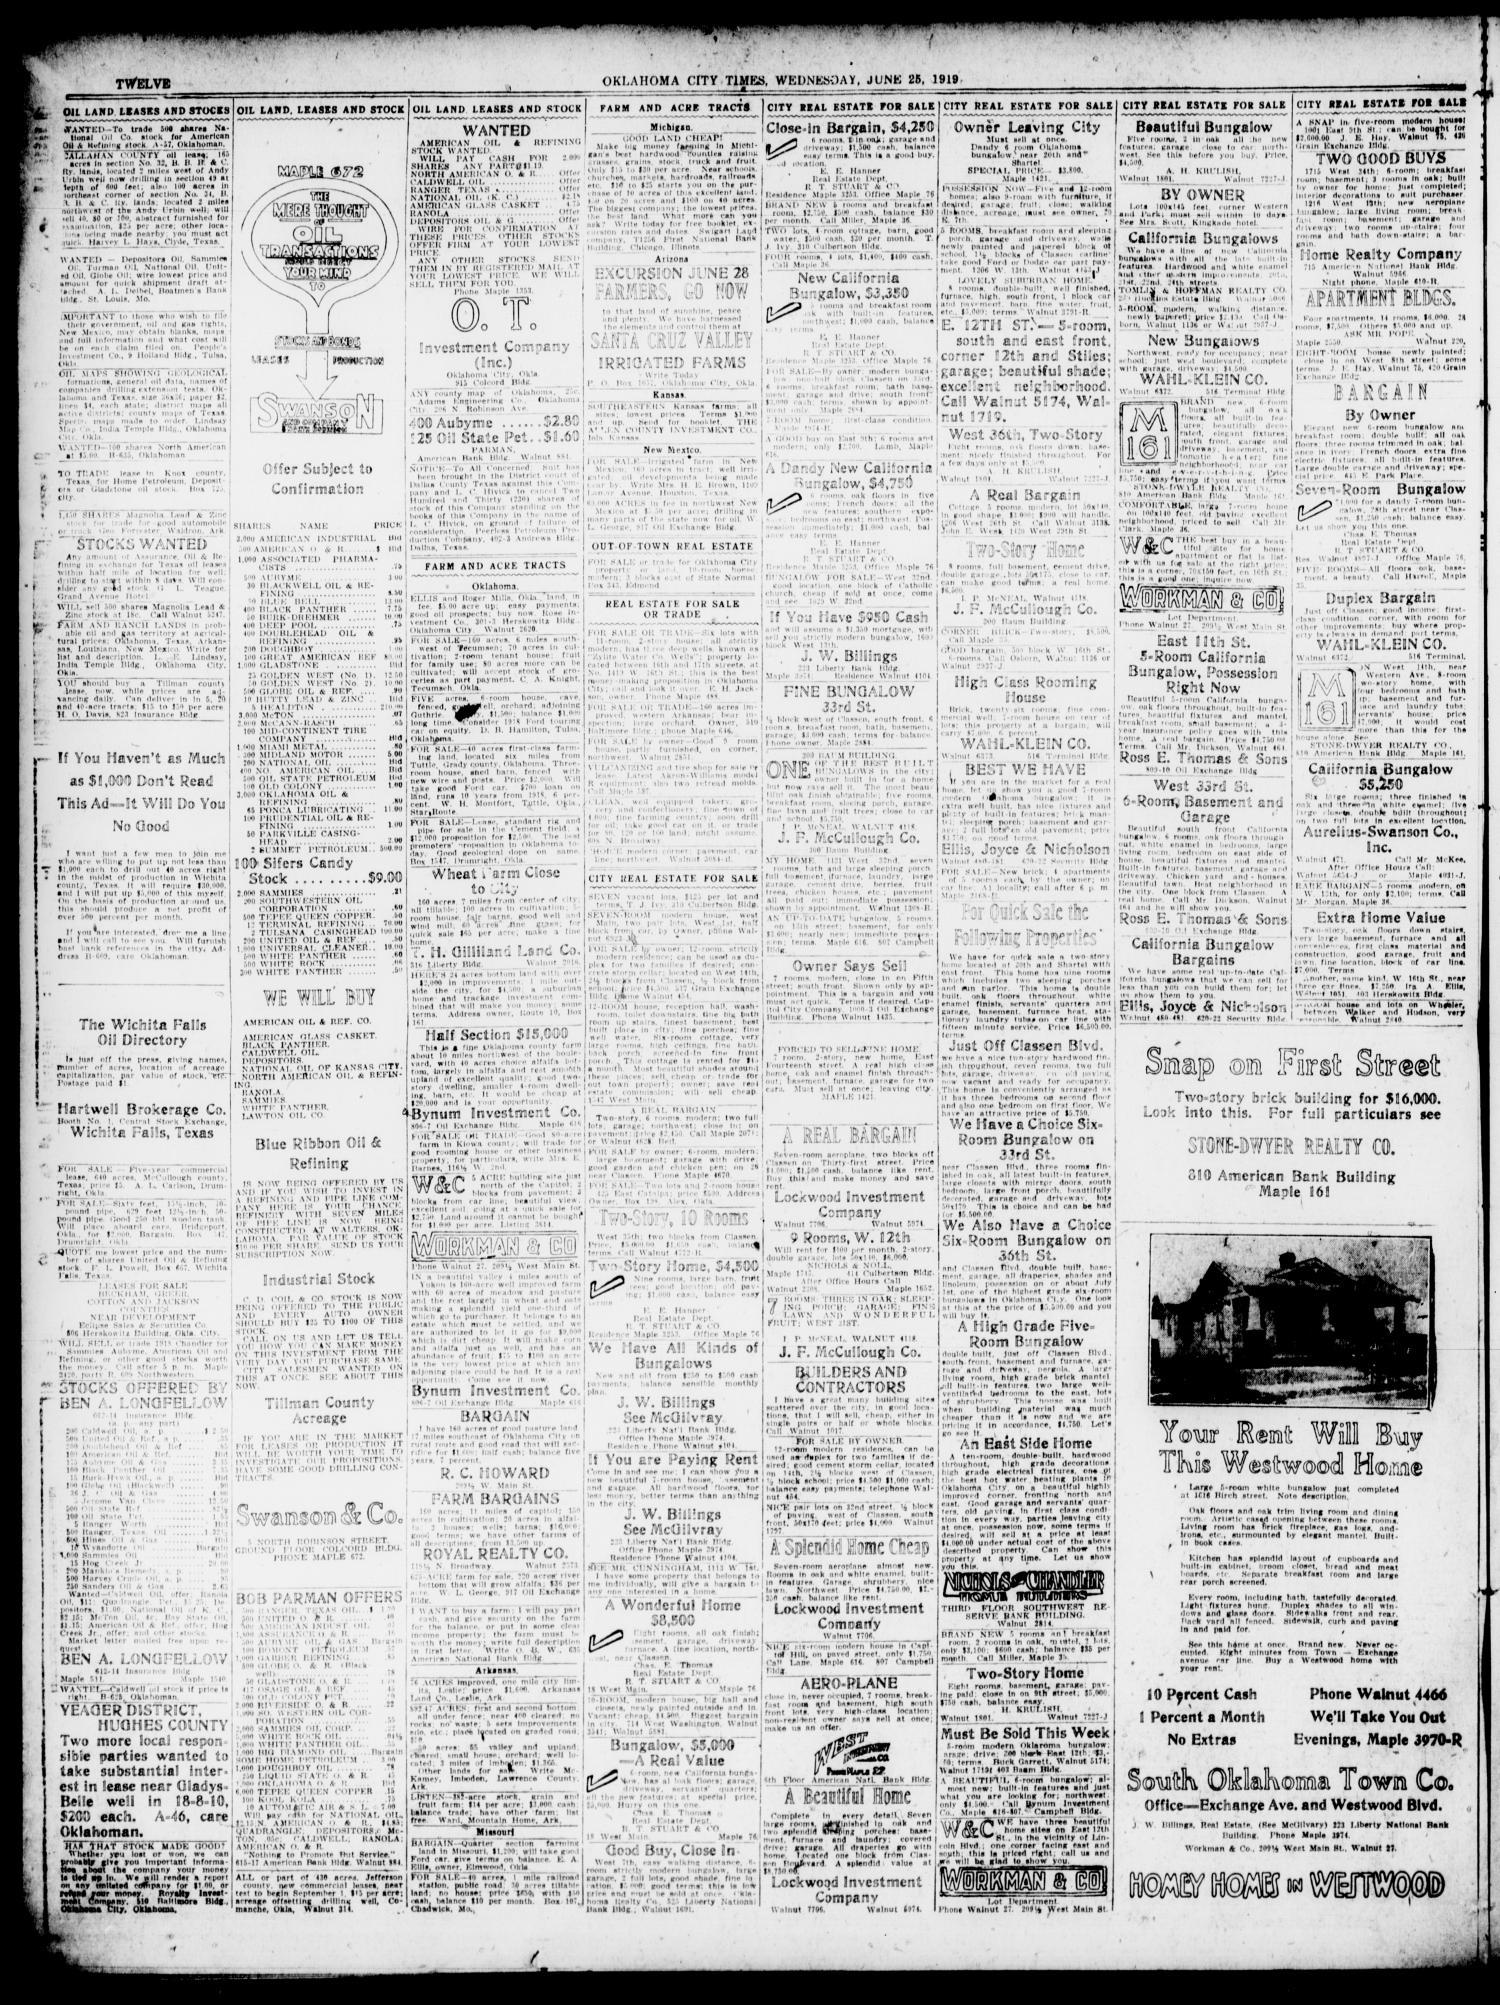 Oklahoma City Times Oklahoma City Okla Vol 31 No 66 Ed 1 Wednesday June 25 1919 Page 12 of 14 The Gateway to Oklahoma History